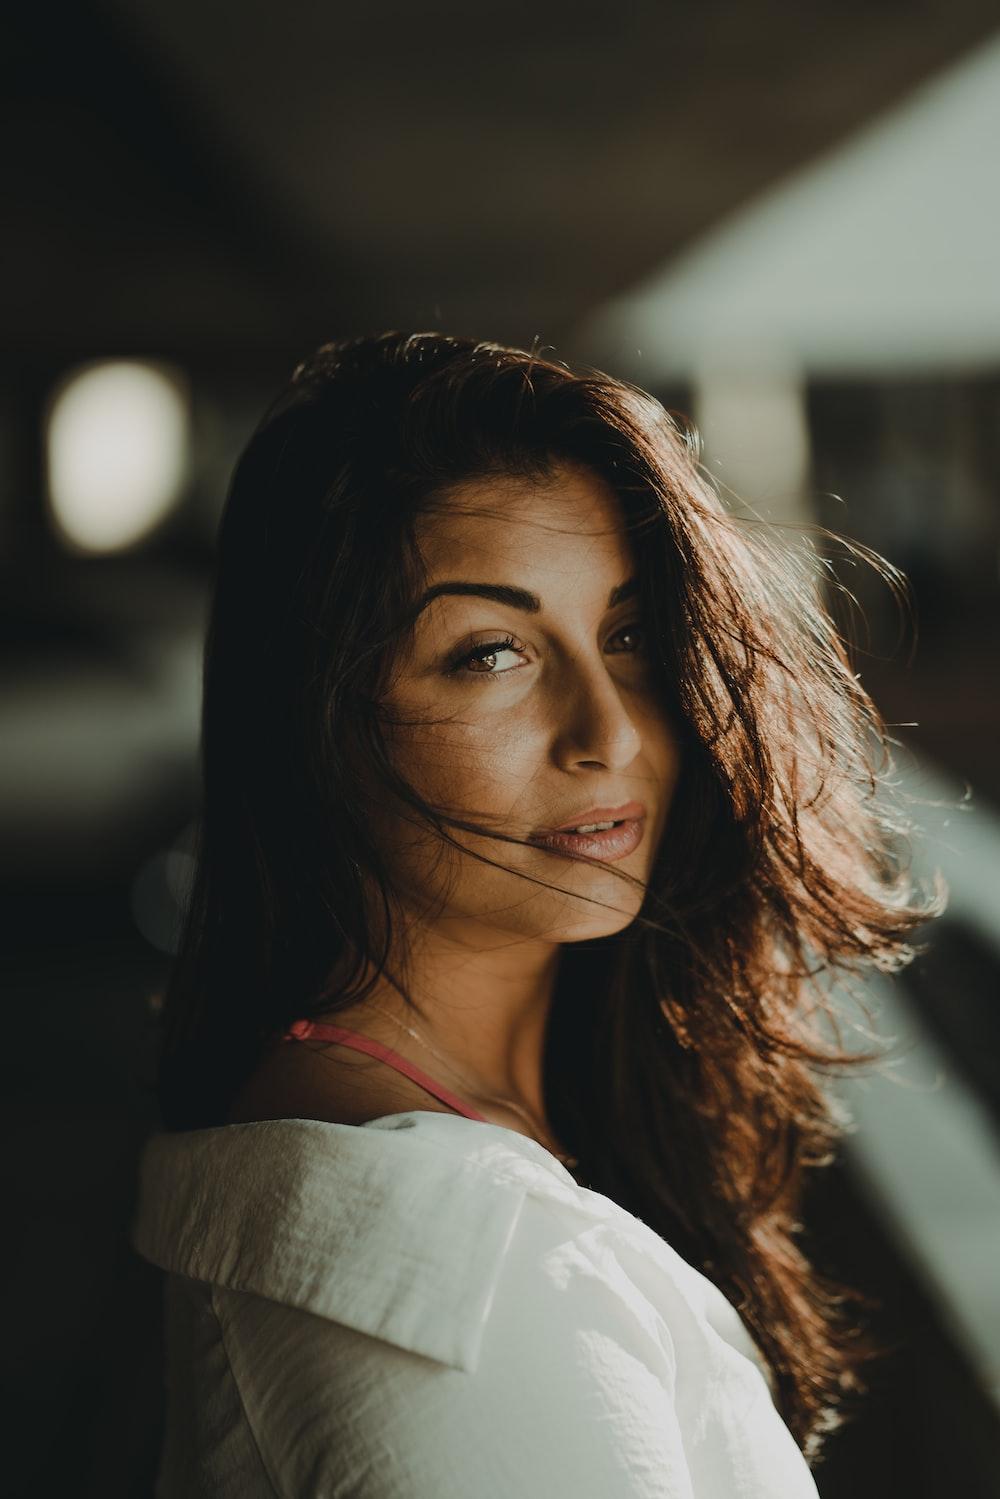 woman wearing white shirt